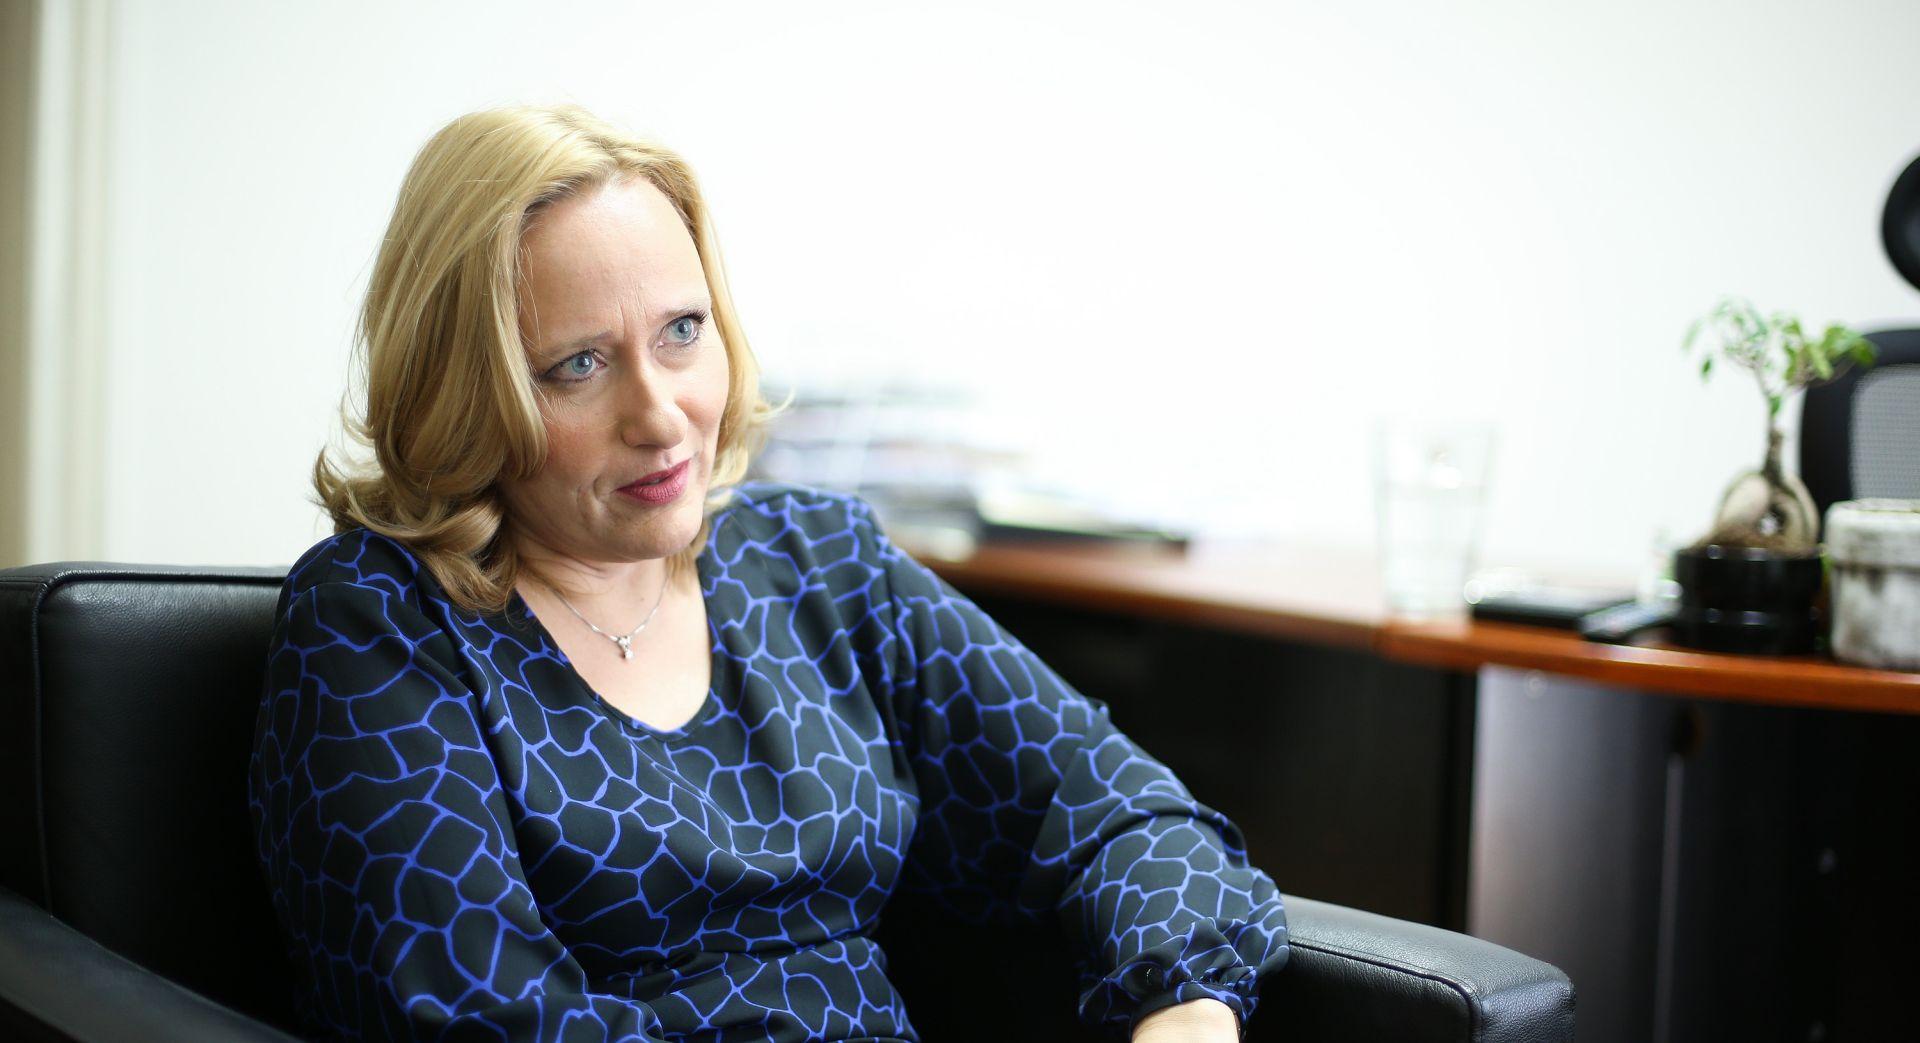 Pravobraniteljice: MUP za slučaj 9-godišnjeg migranta zna od lipnja 2017.